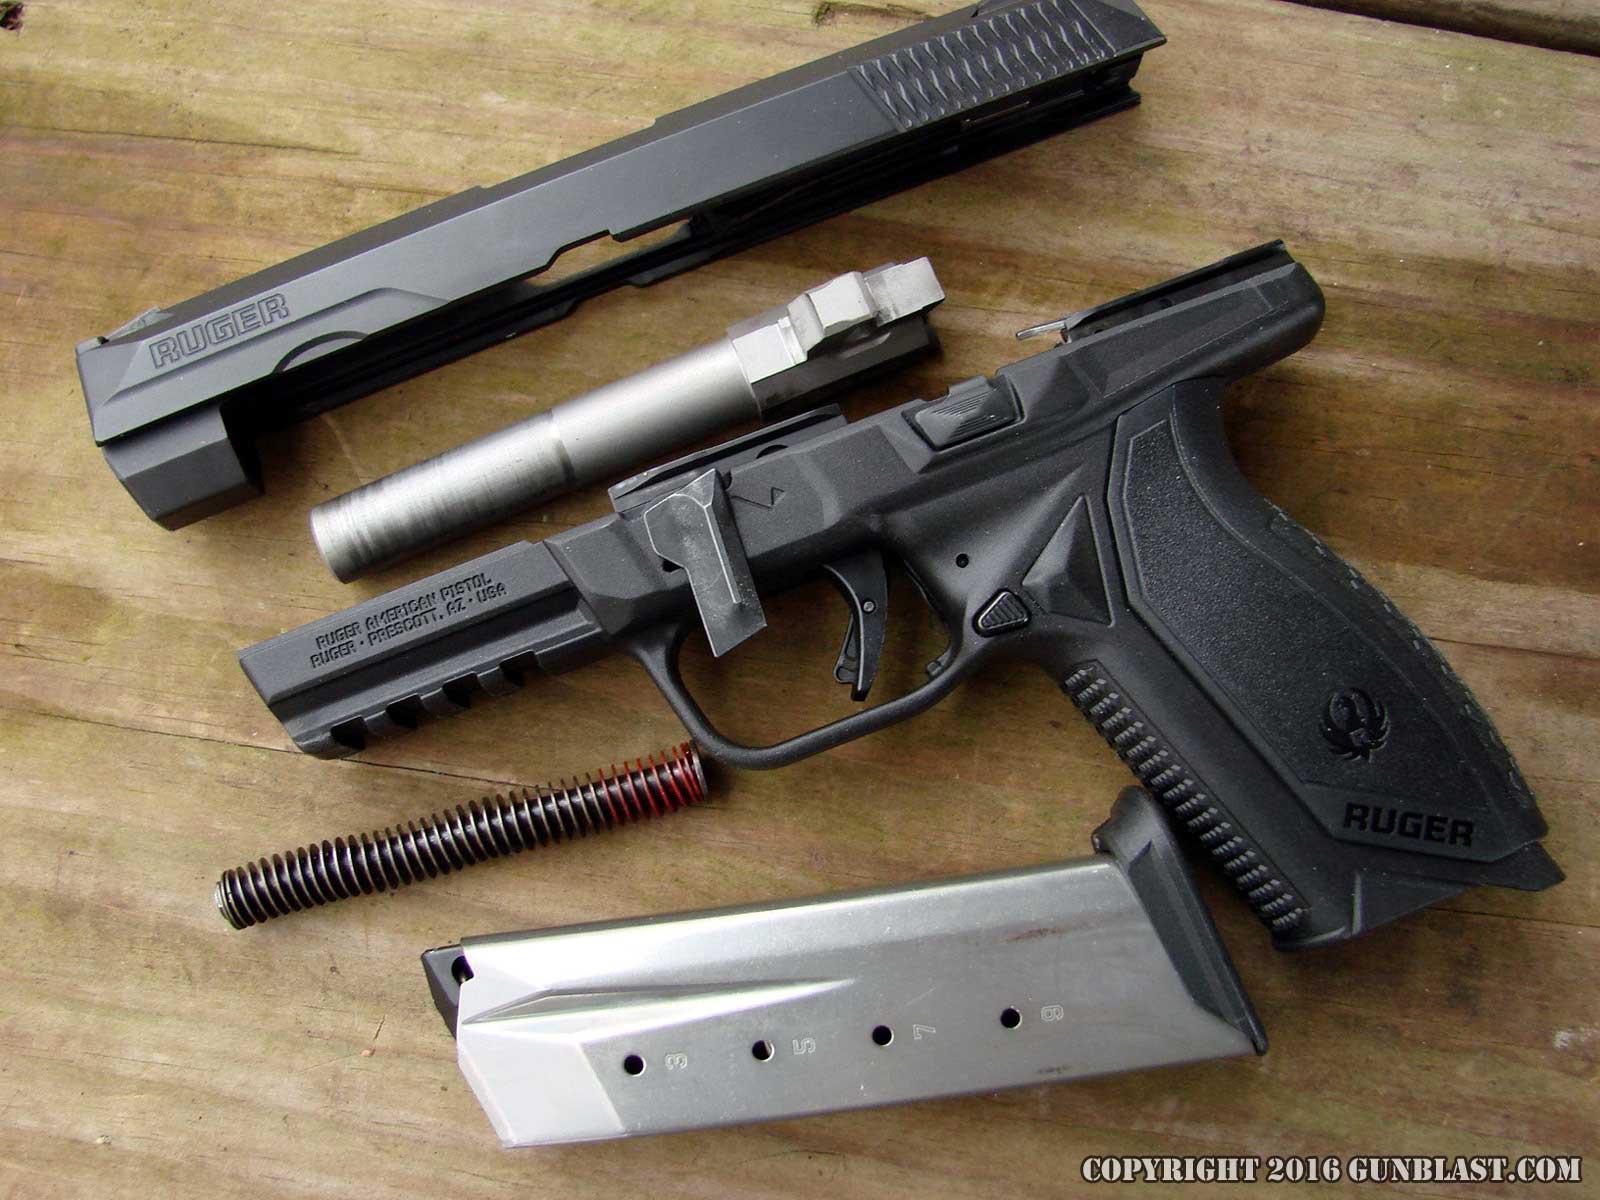 Ruger American 45 ACP Semi-Automatic Pistol